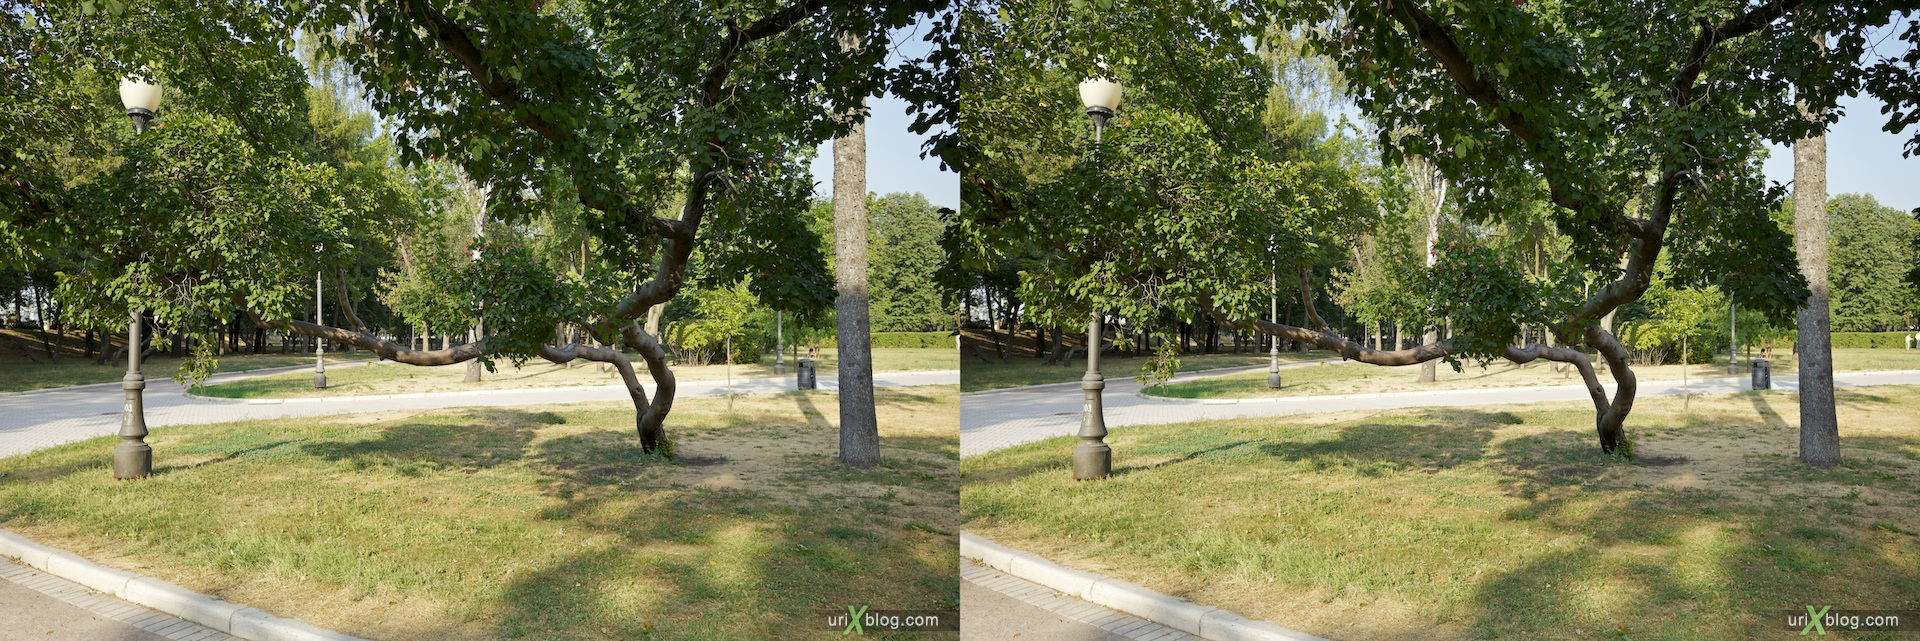 парк 3D, stereo, cross-eyed, стерео, стереопара Новодевичий монастырь Москва Novodevichiy monastyr Moscow